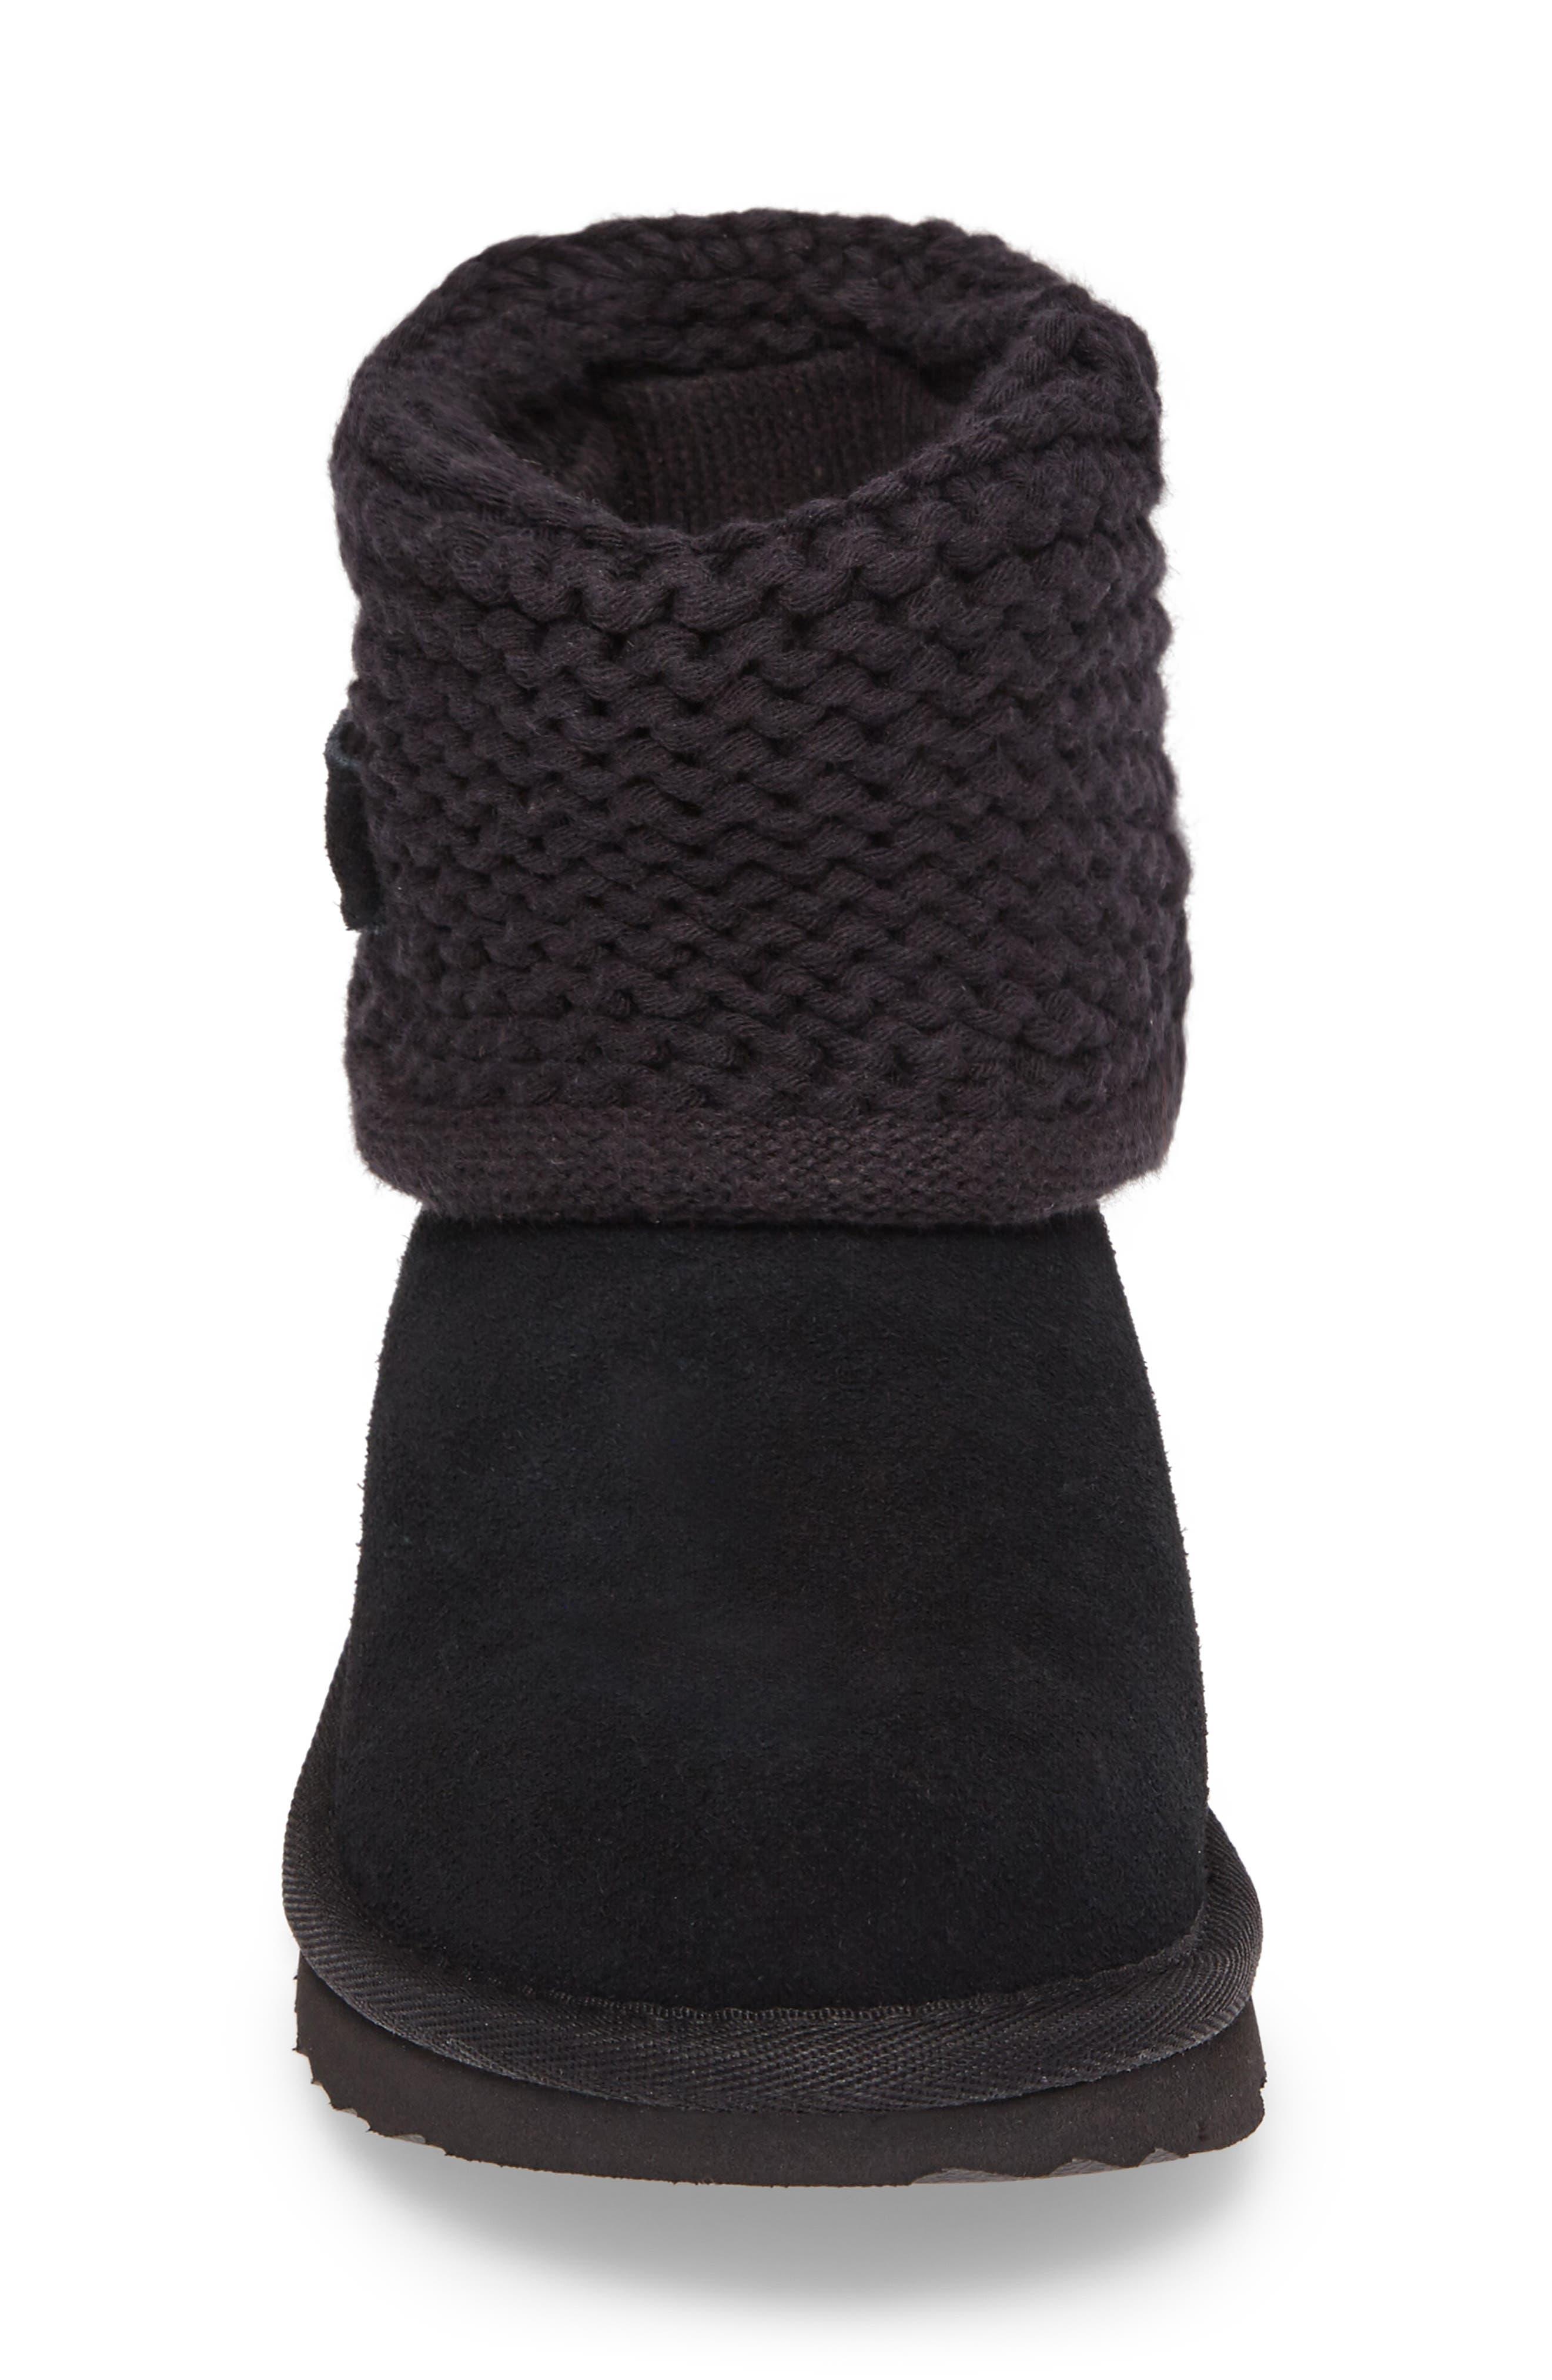 Darrah II Knit Cuff Boot,                             Alternate thumbnail 4, color,                             001